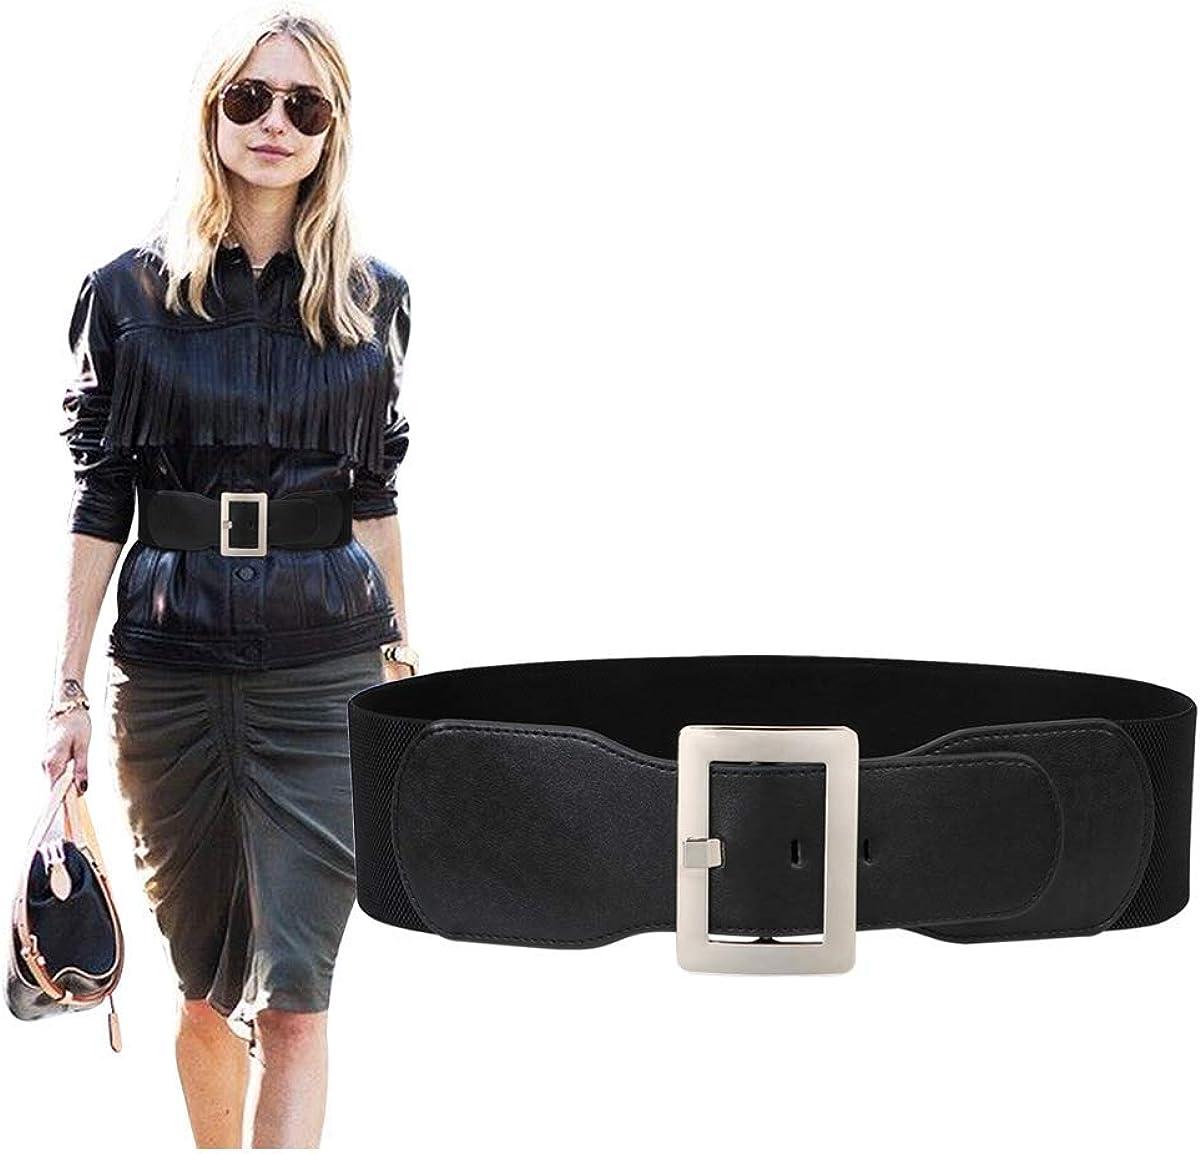 Women Wide Cinch Waist Belt Ladies Fashion Belt for Dresses with Metal  Buckle